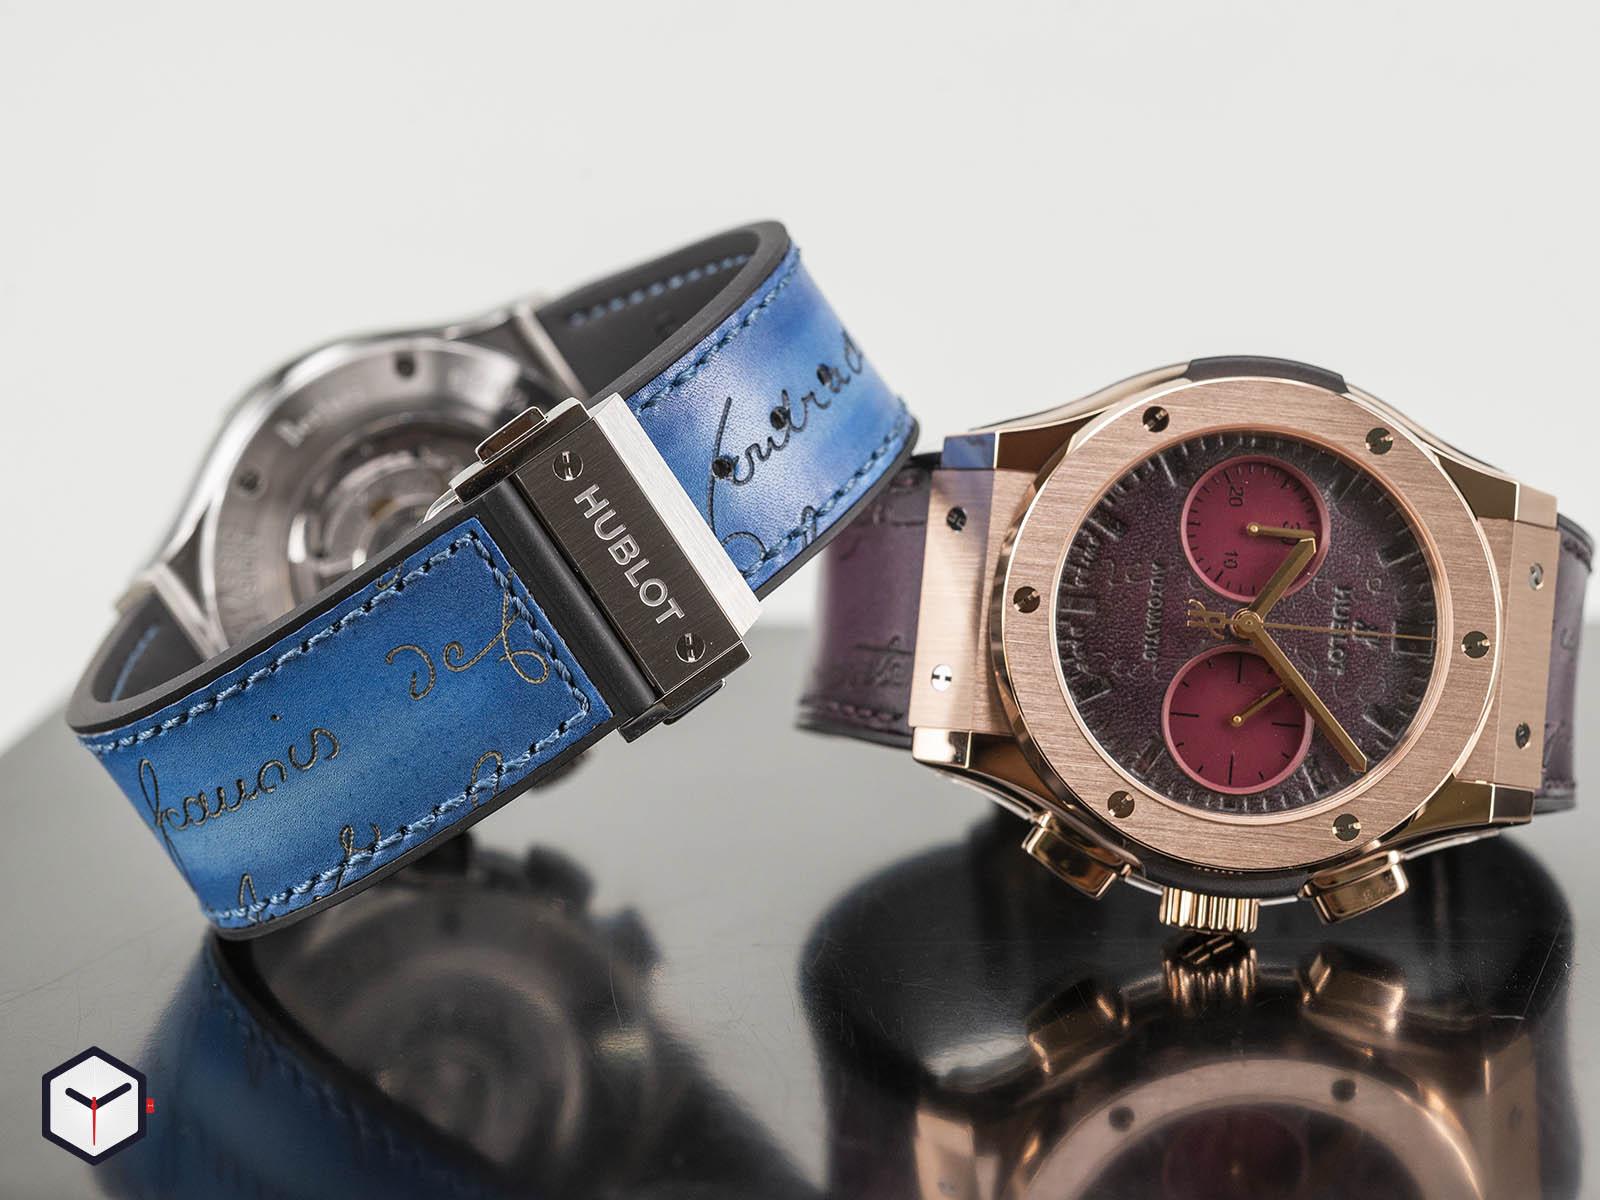 521-nx-050b-vr-ber18-hublot-classic-fusion-chronograph-berluti-scritto-ocean-blue-45mm-8.jpg